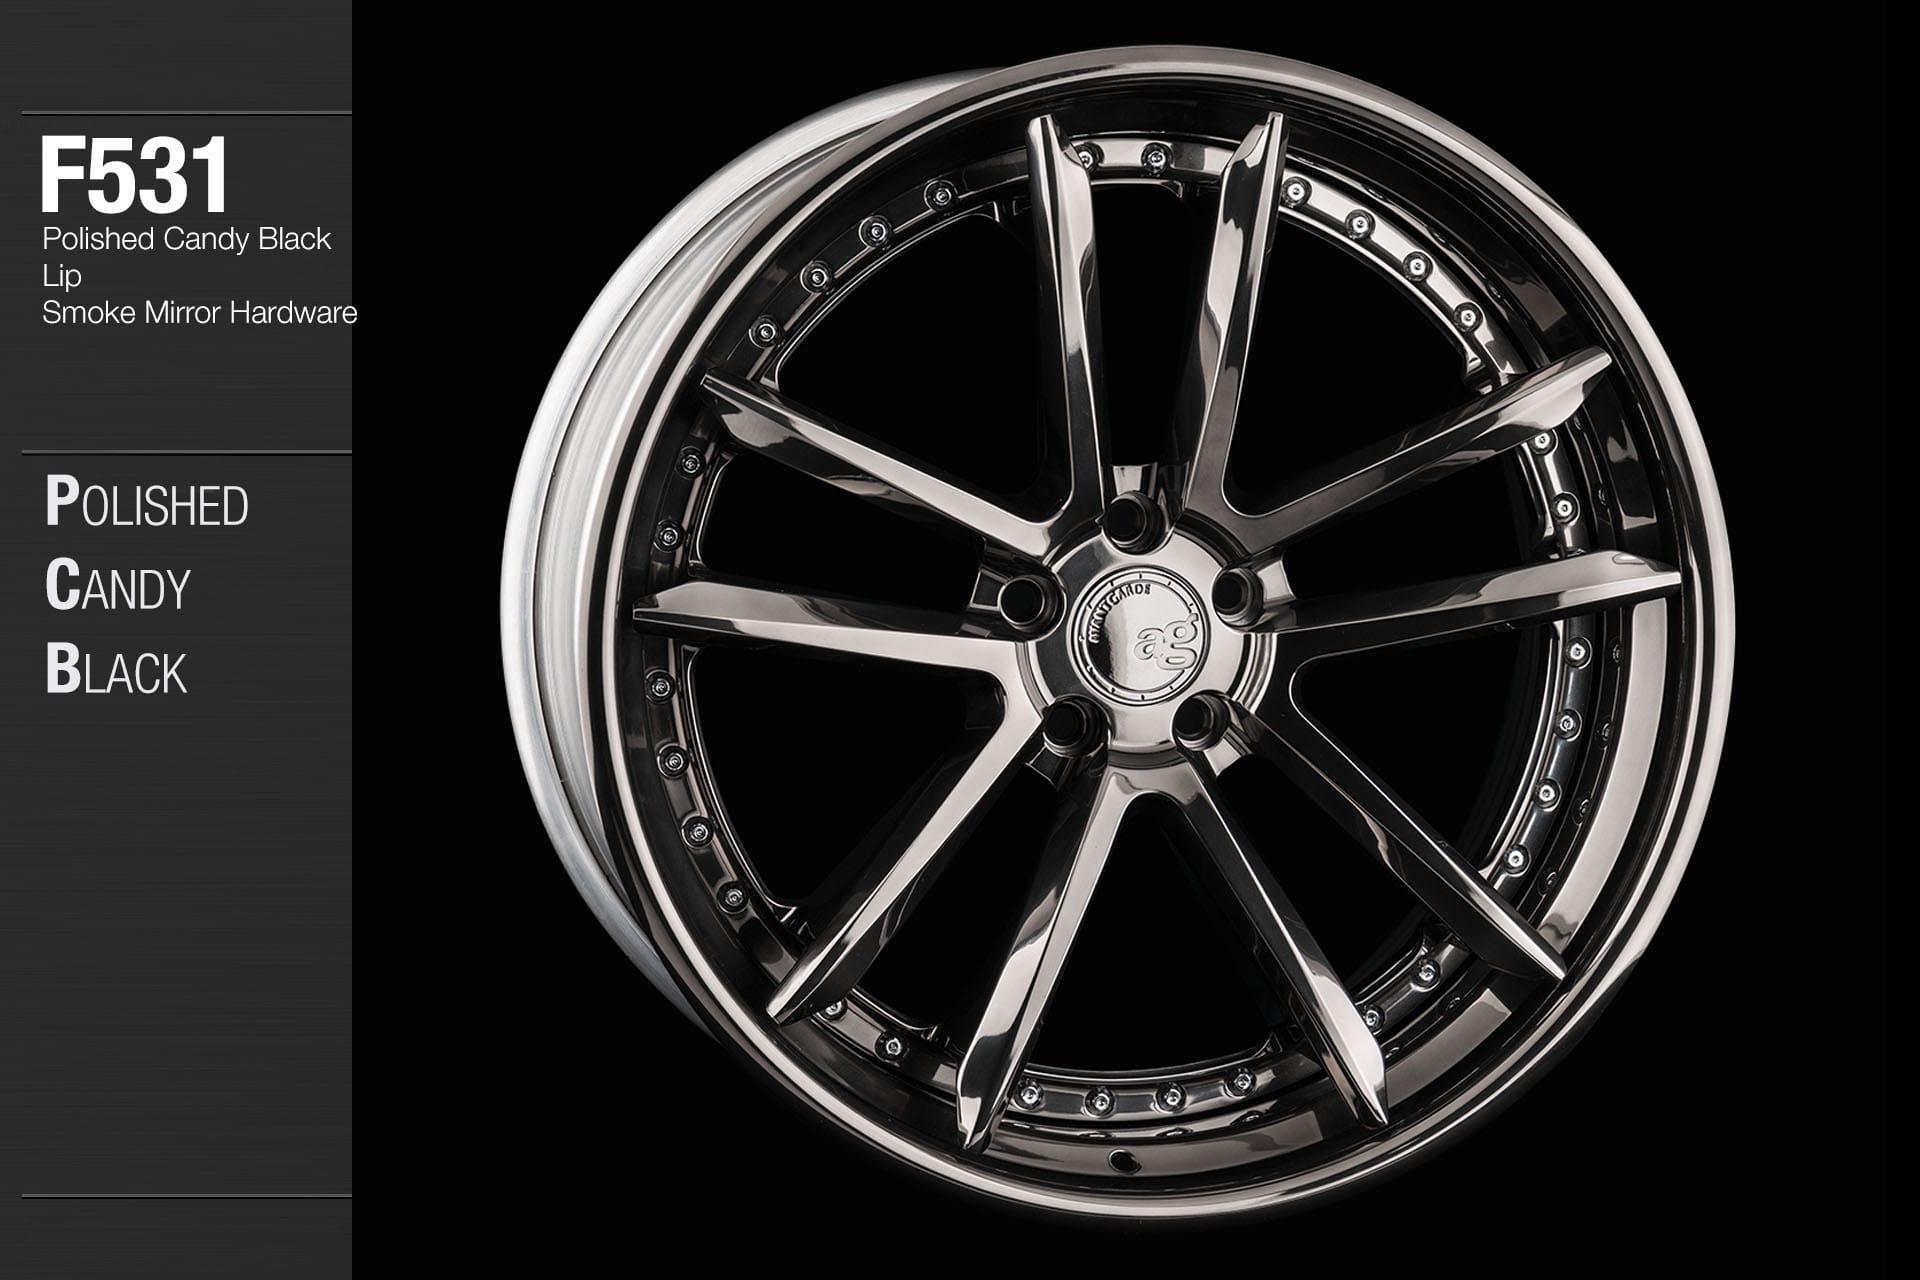 avant-garde-ag-wheels-f531-polished-candy-black-face-lip-smoke-mirror-hardware-4-min